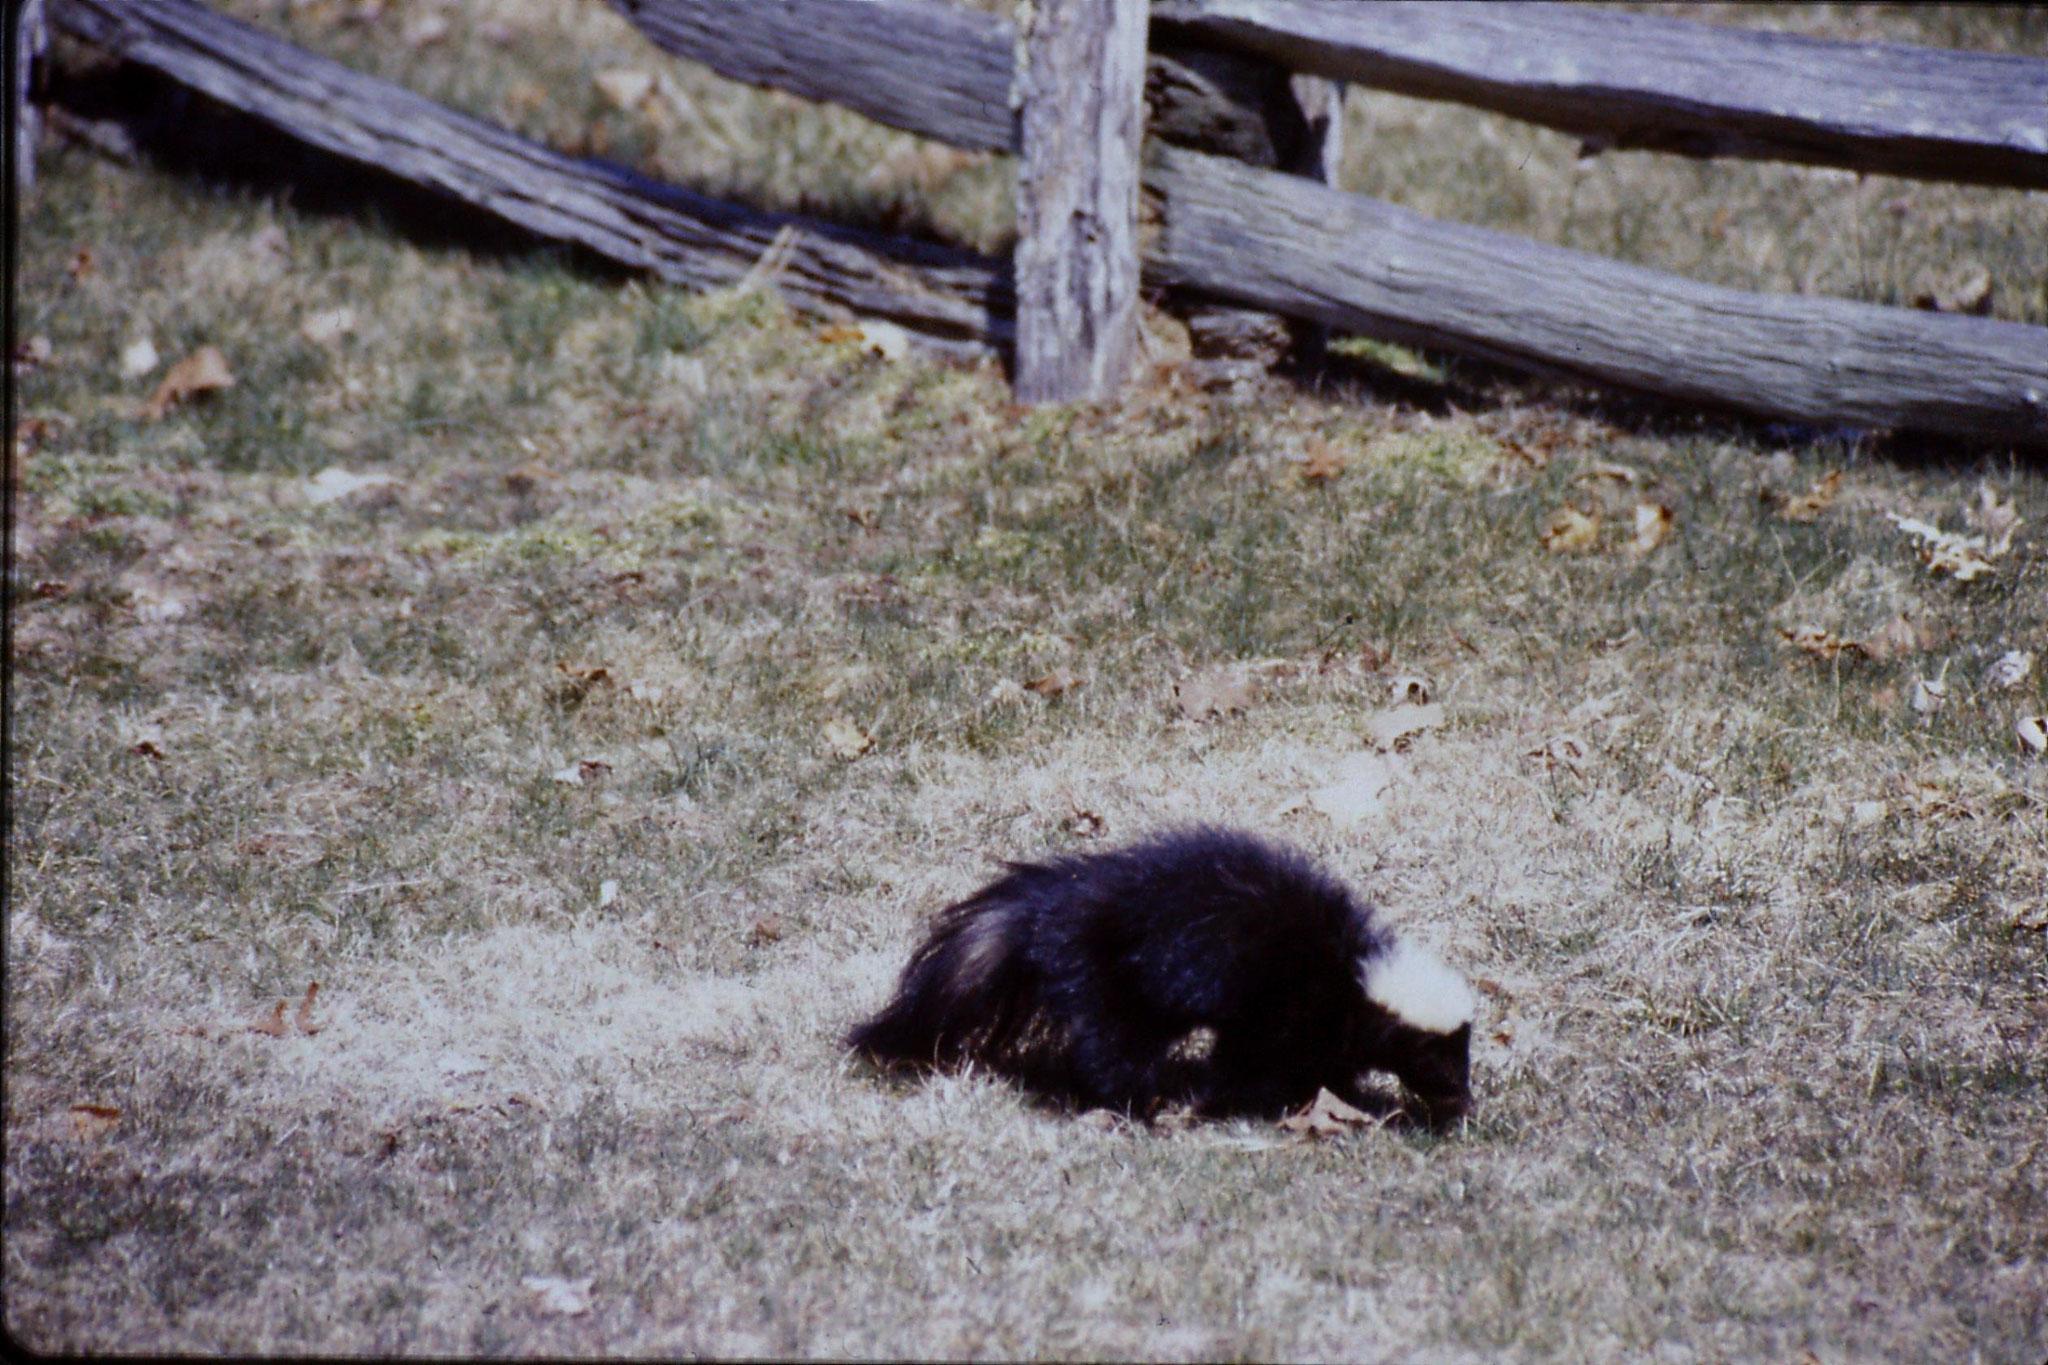 17/3/1991: 27: Benge Gap skunk